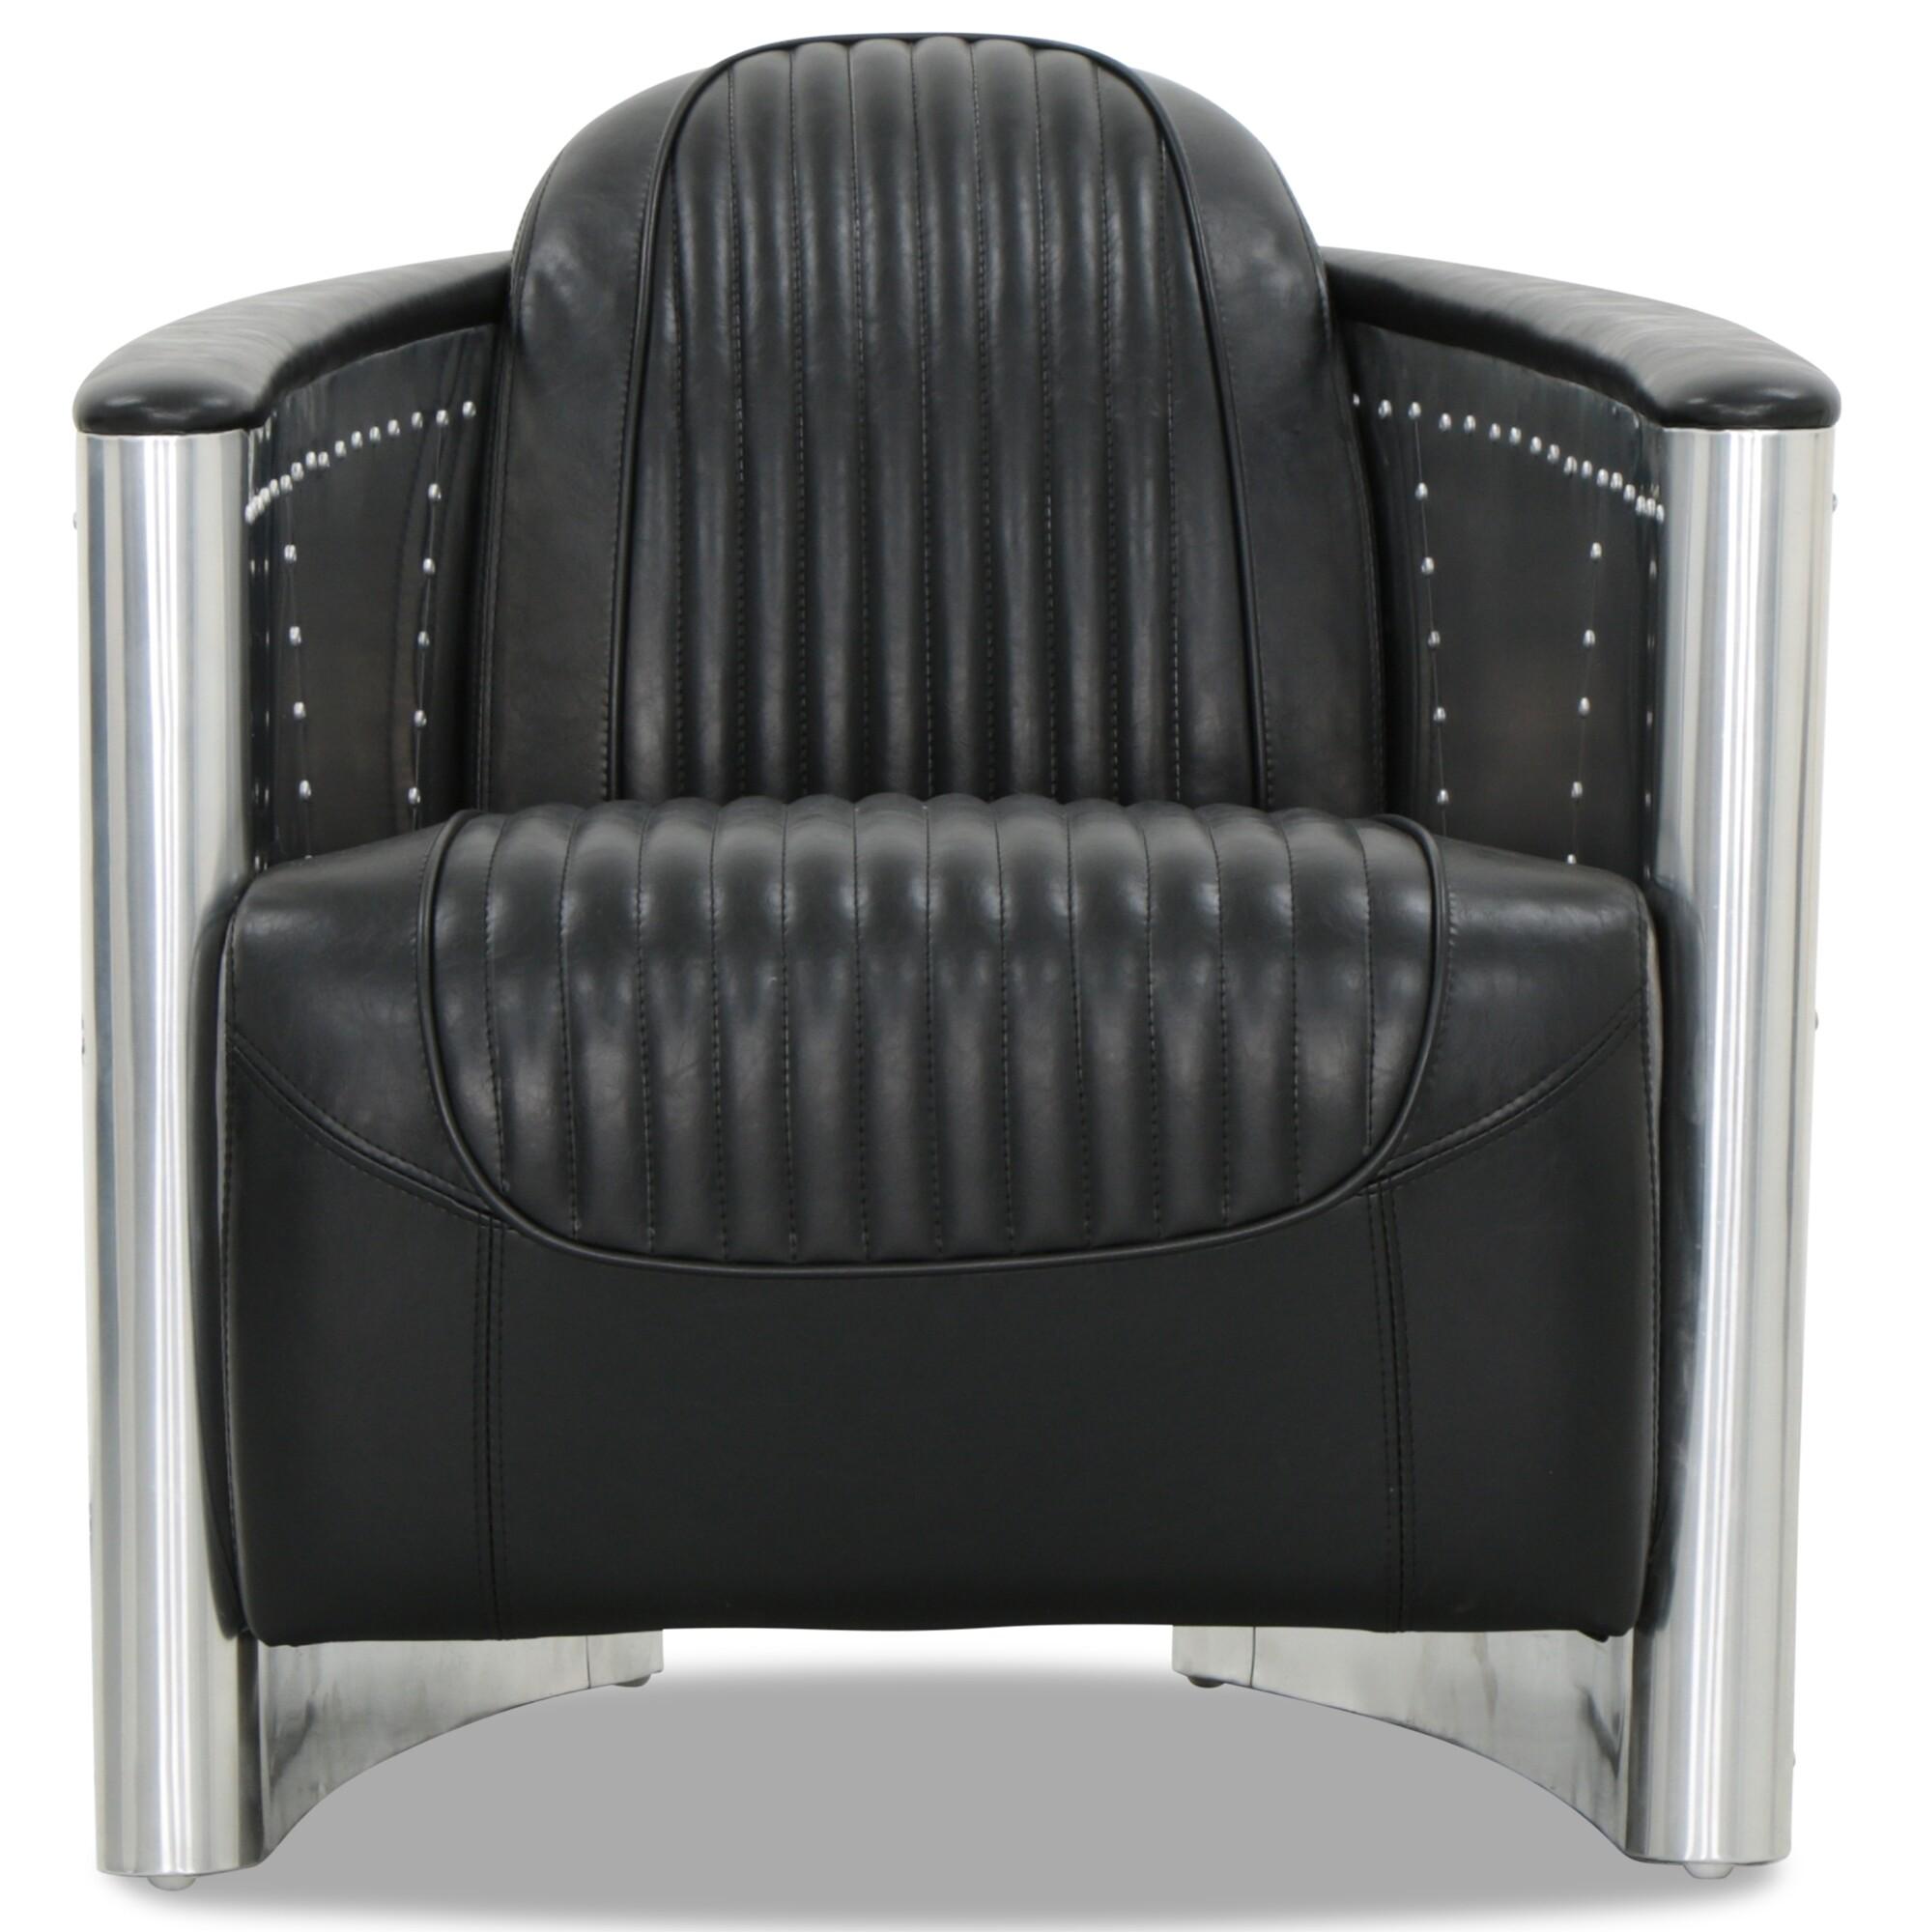 Designer Replica Aviator Arm Chair In Black Pu Leather With Aluminium Silver